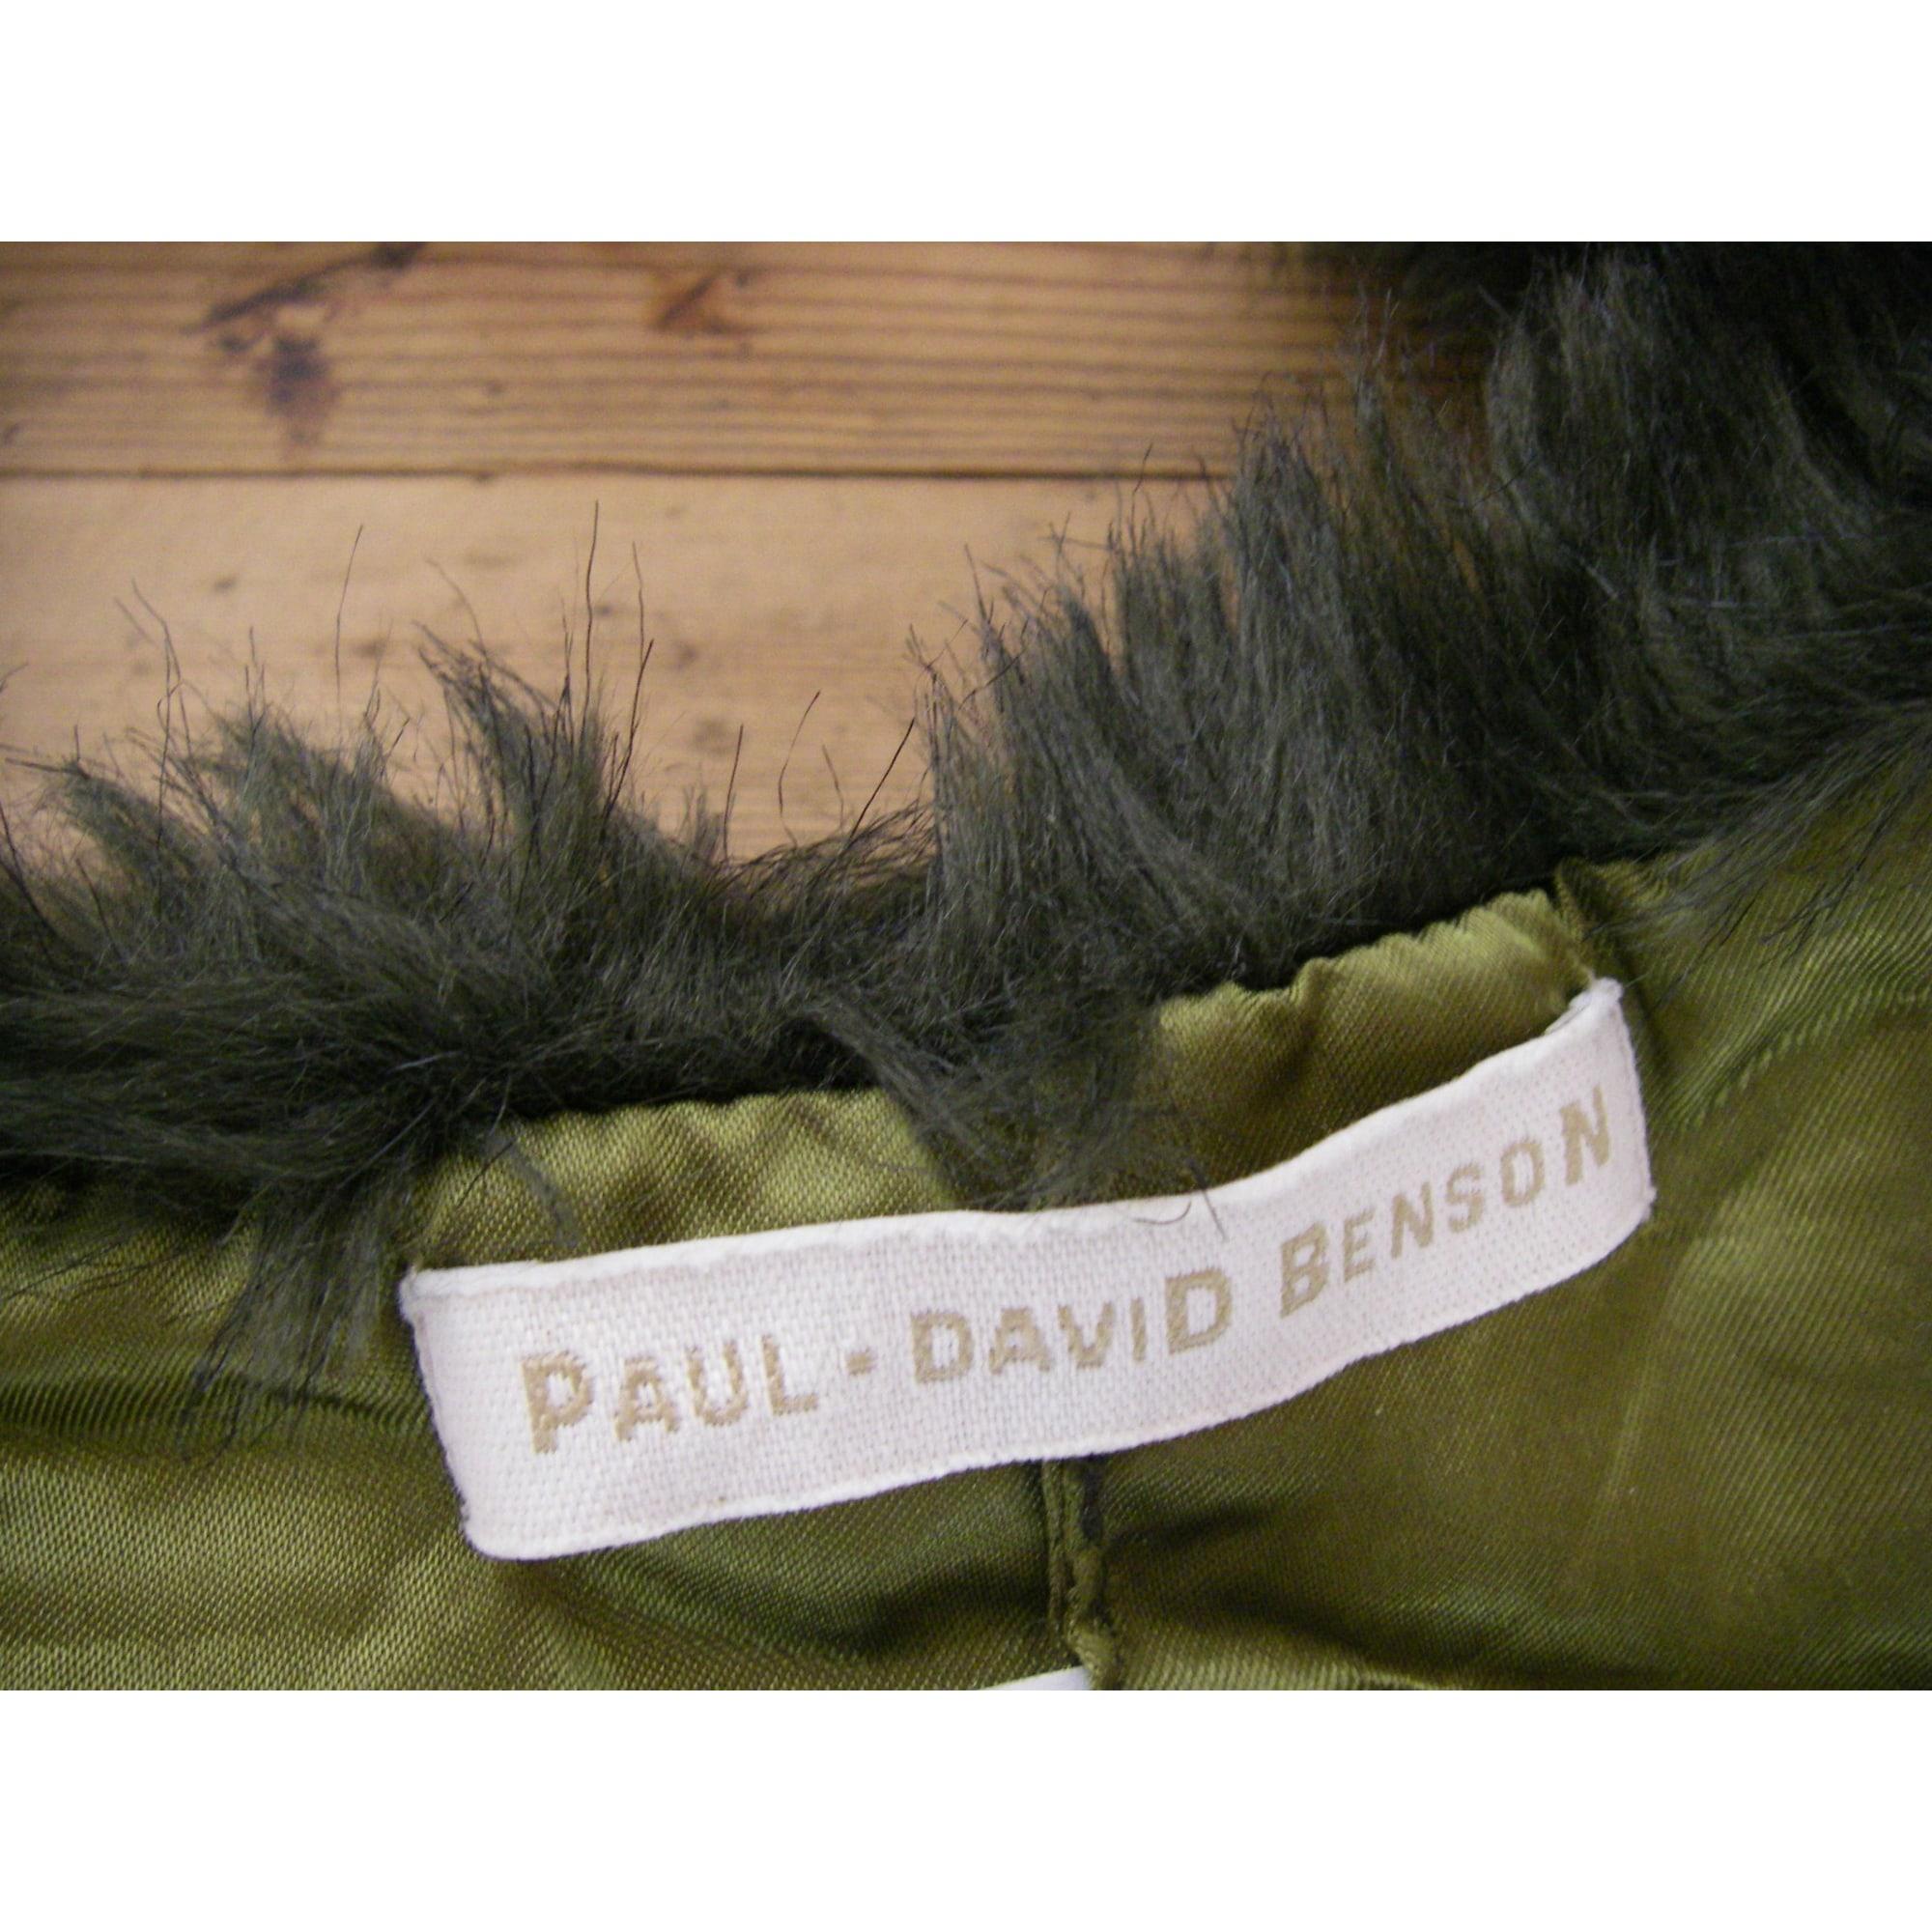 Echarpe PAUL DAVID BENSON Vert